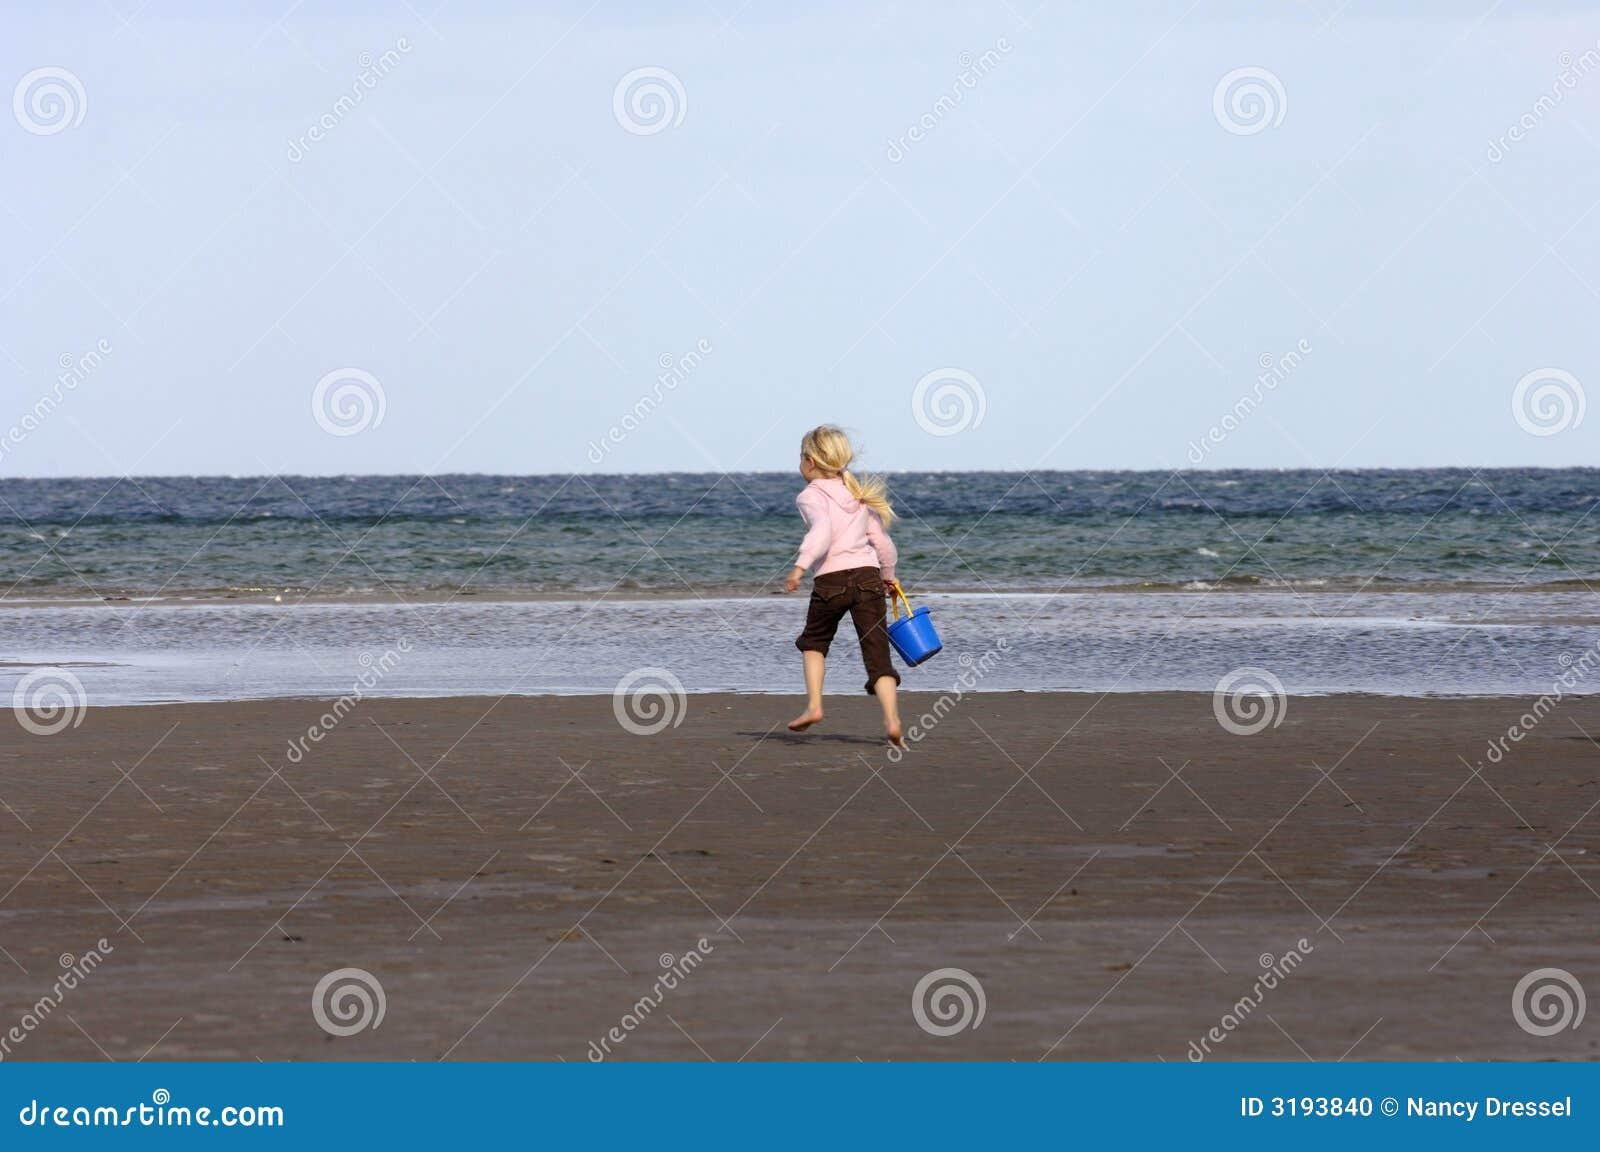 Girl Running On Beach Stock Photo - Image: 3193840 Girl Running On Beach